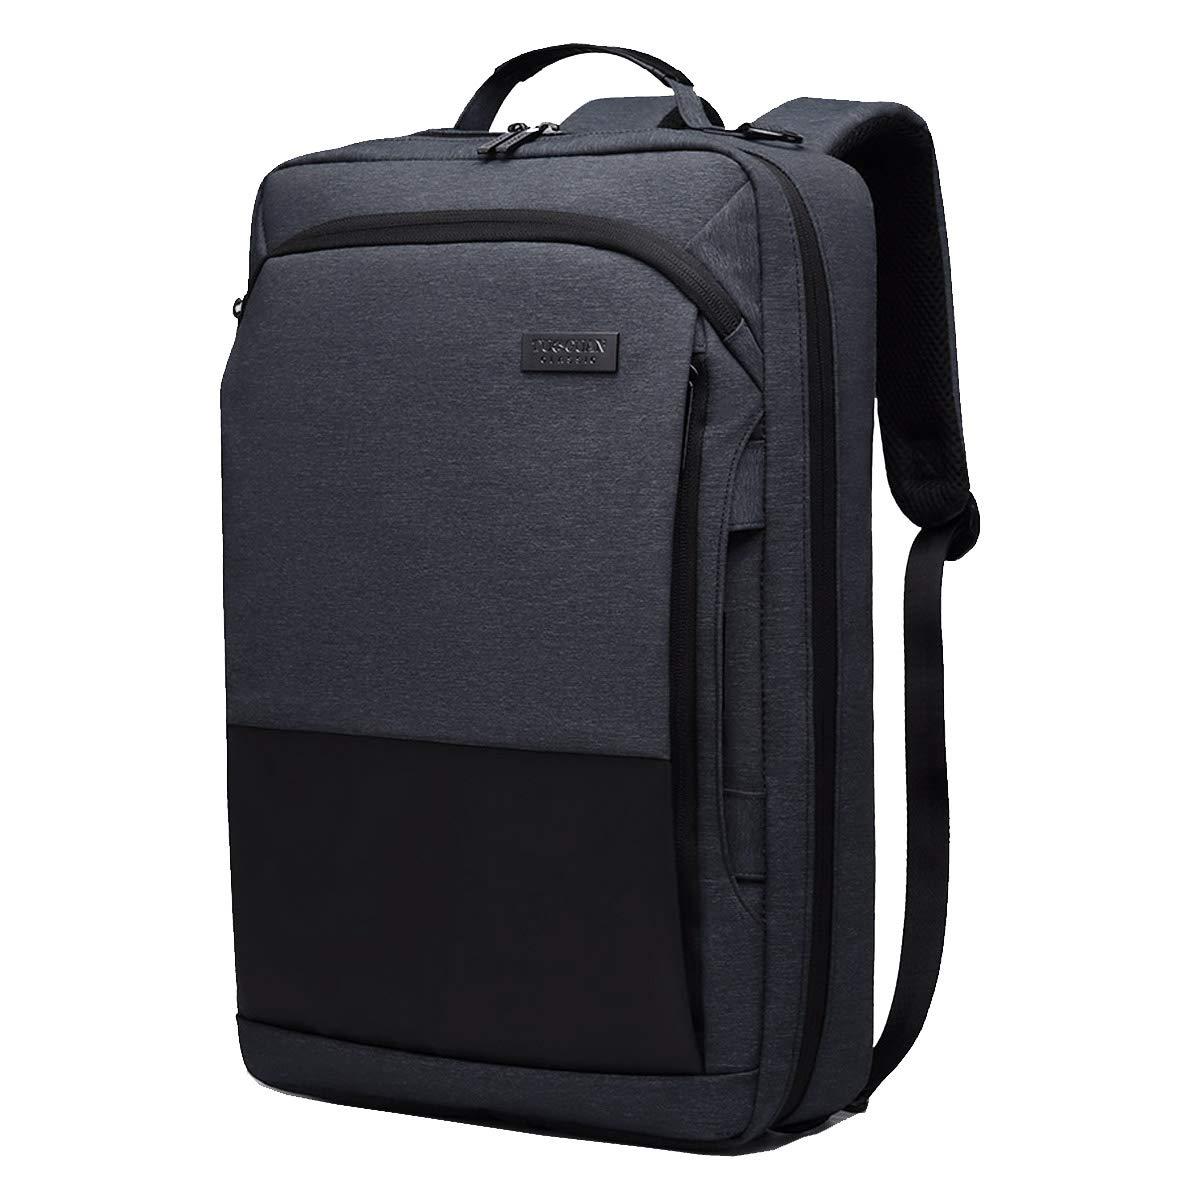 KOLAKO Messenger Convertible Briefcase Multi Functional